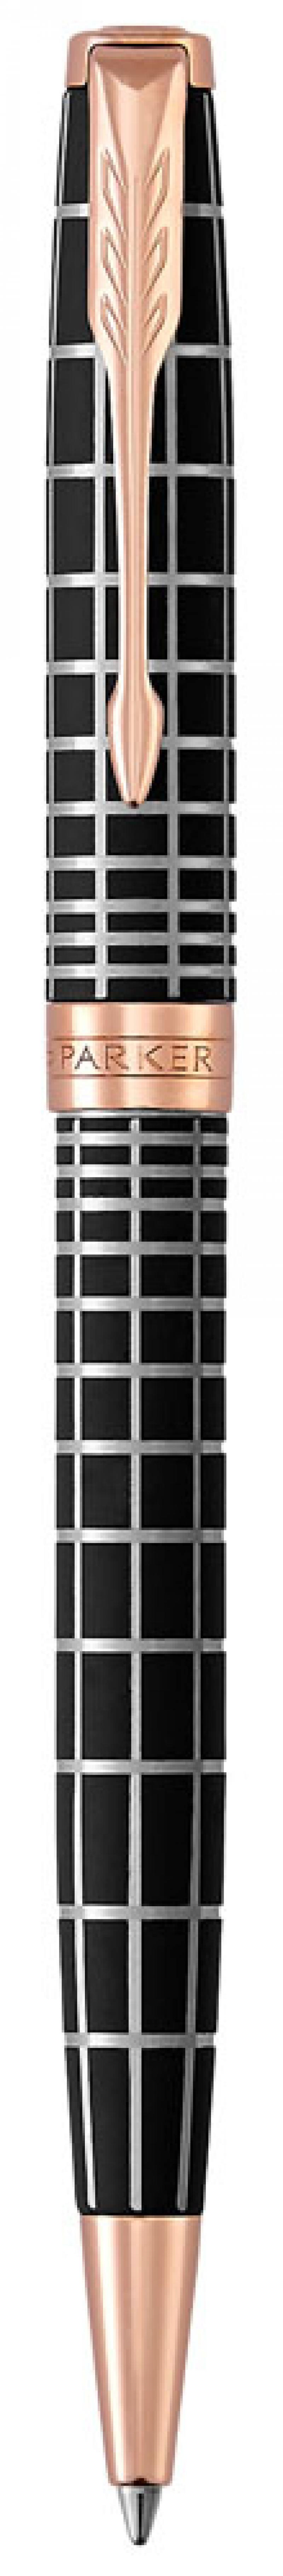 Шариковая ручка поворотная Parker Sonnet Premium K531 Masculine Brown PGT черный M 1931483 шариковая ручка поворотная parker sonnet core k527 stainless steel gt черный m 1931507